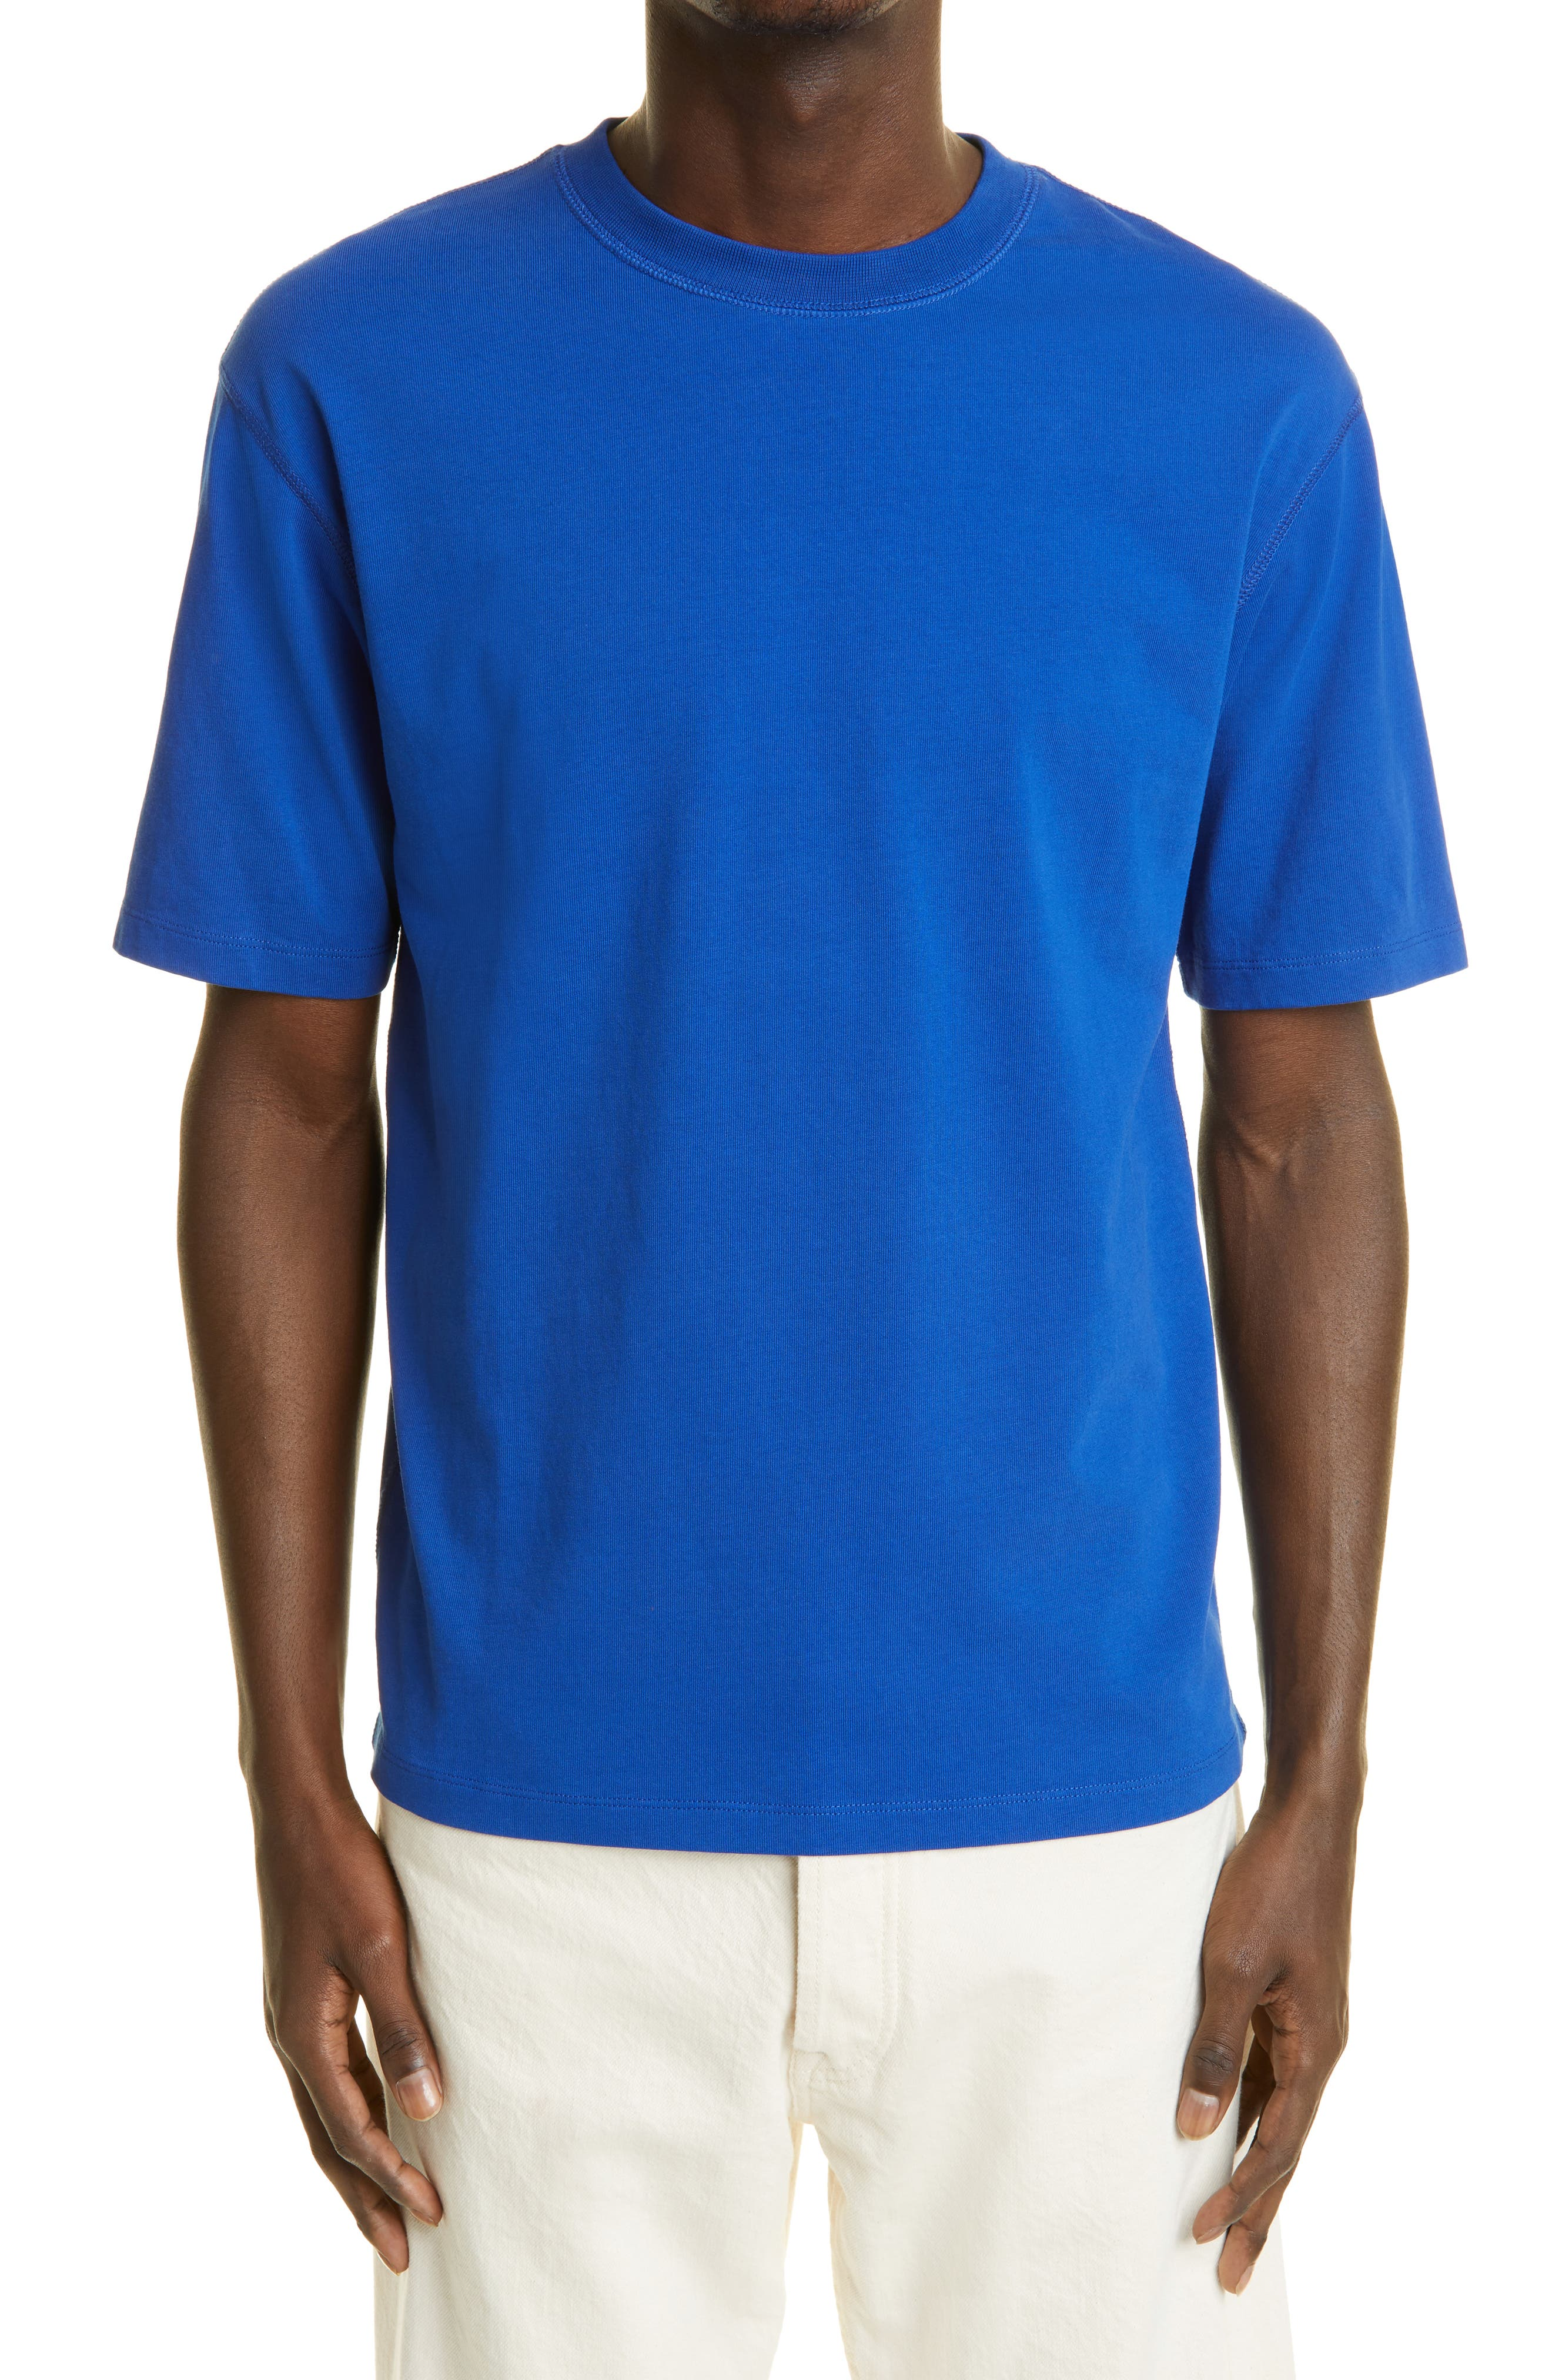 Cotton Hiking T-Shirt